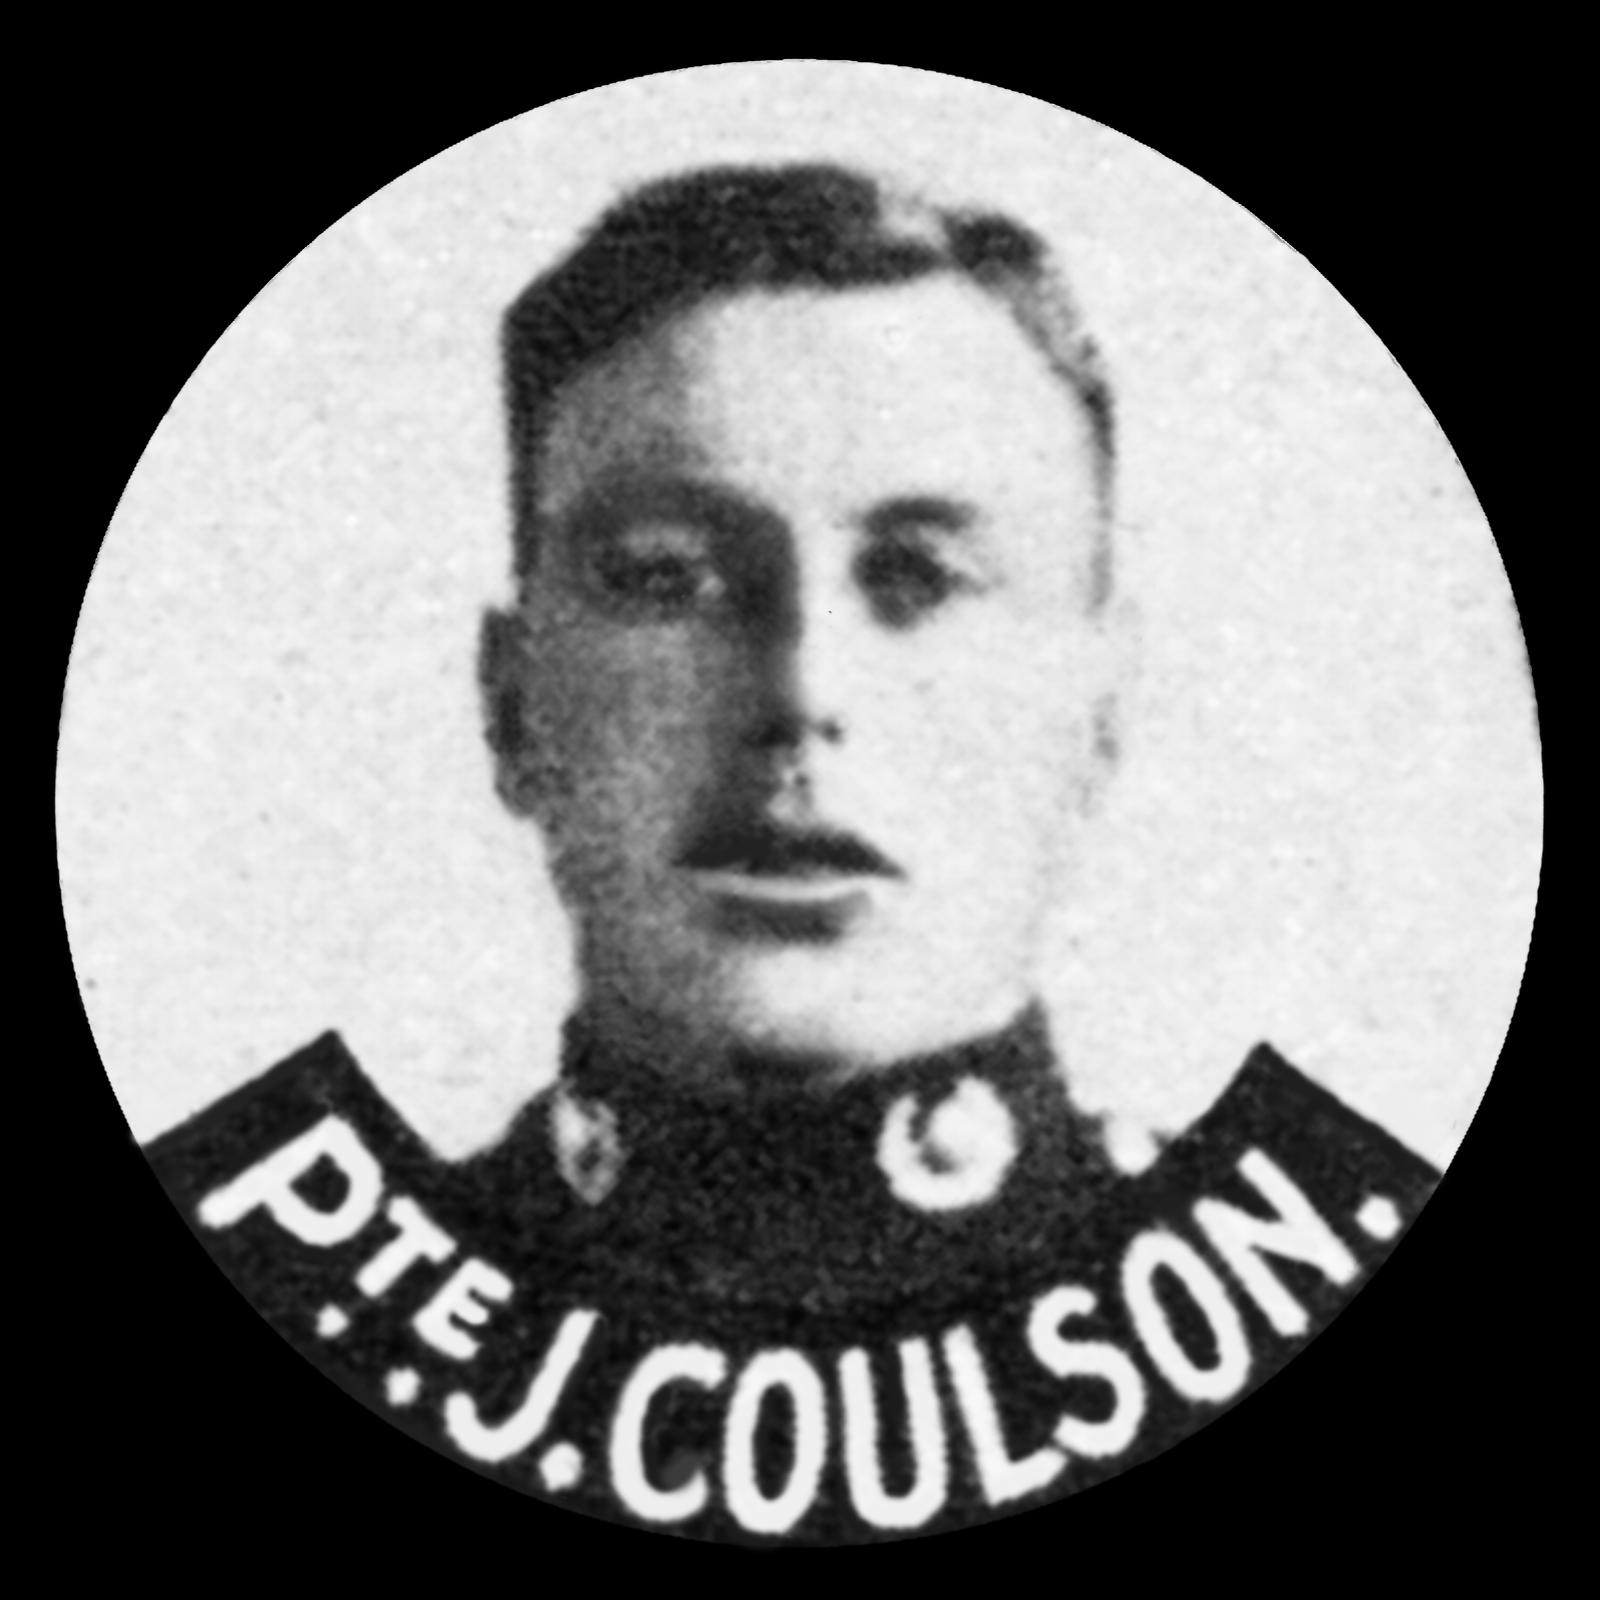 COULSON John